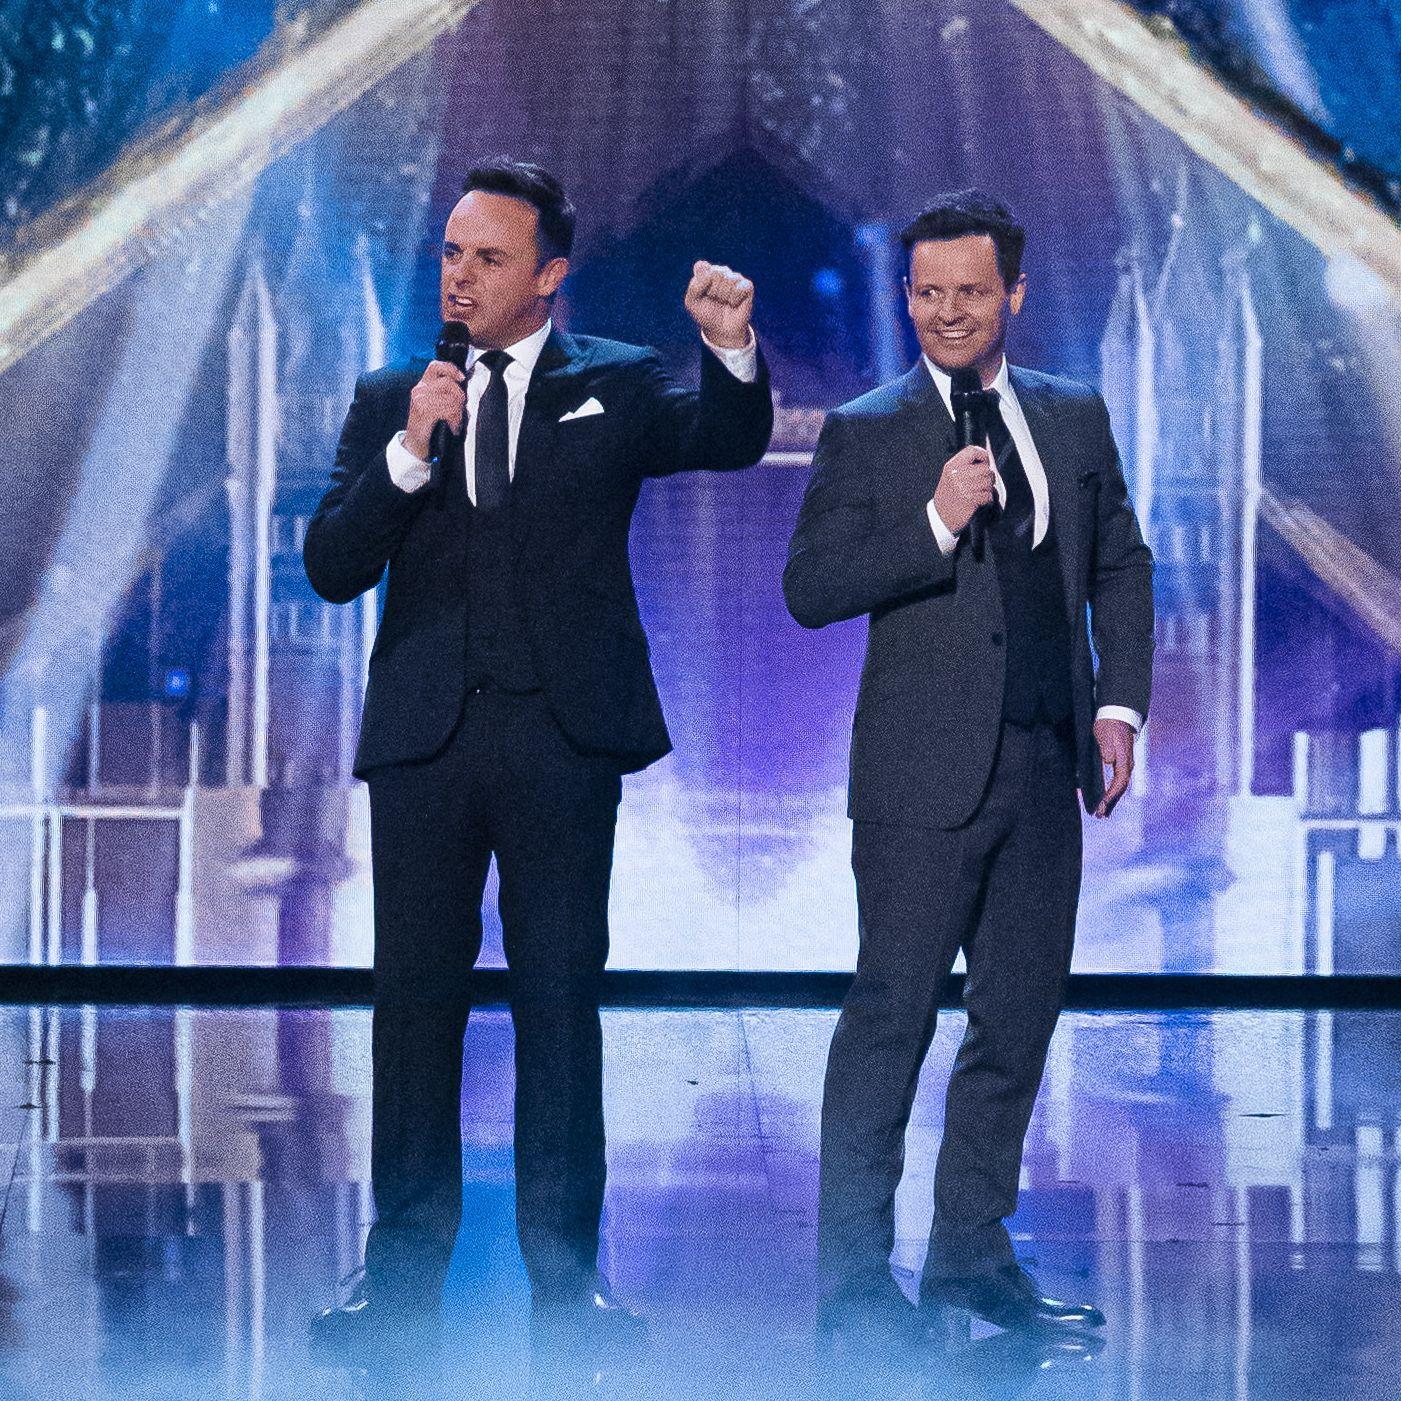 Britain's Got Talent: The Champions unveils its third set of finalists